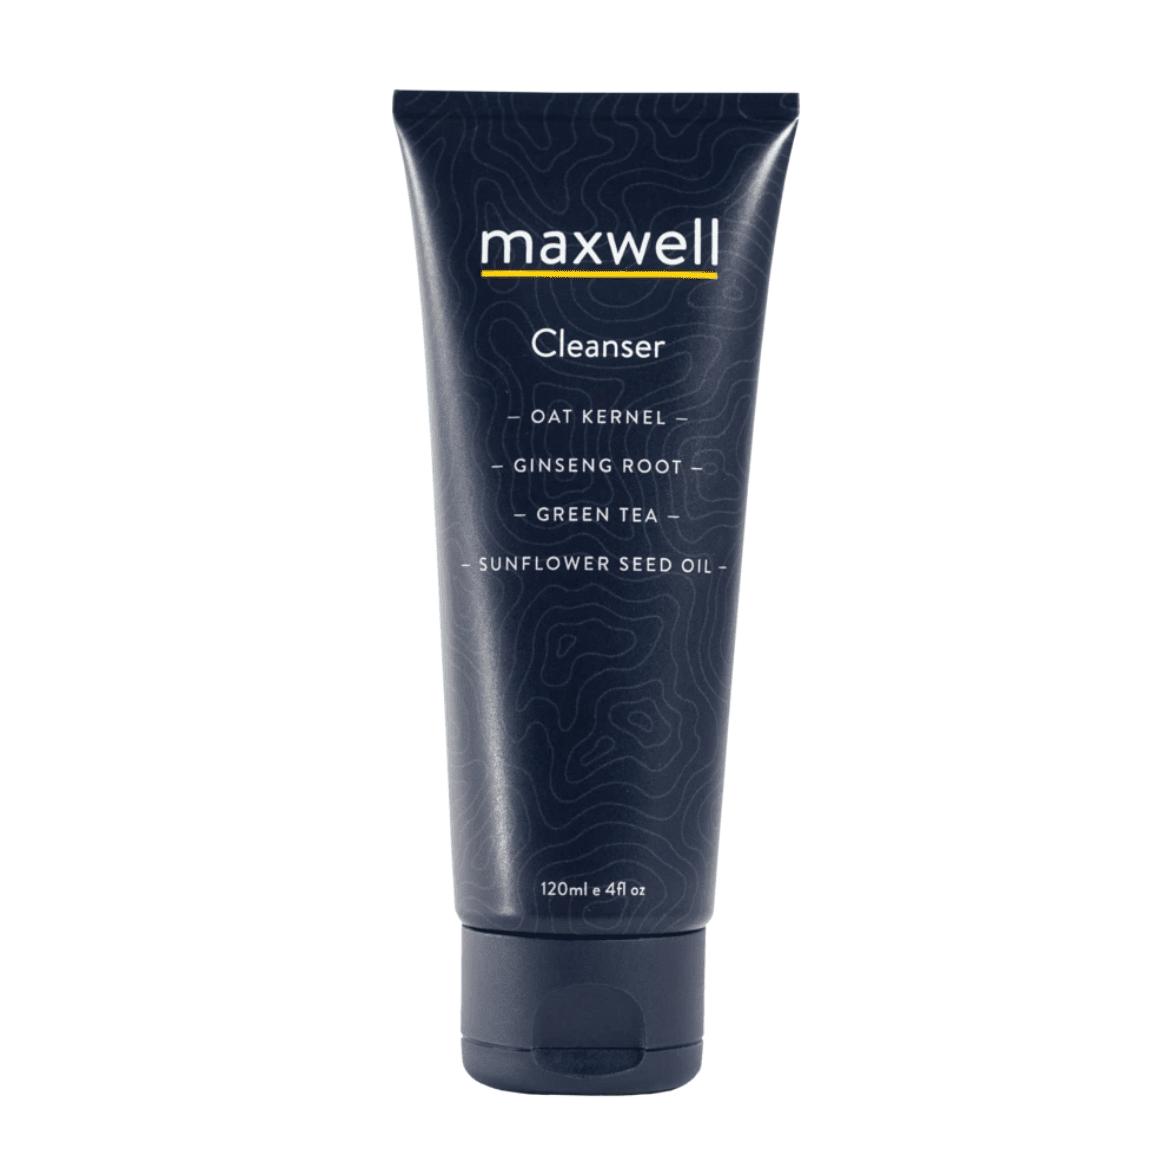 Maxwell Cleanser